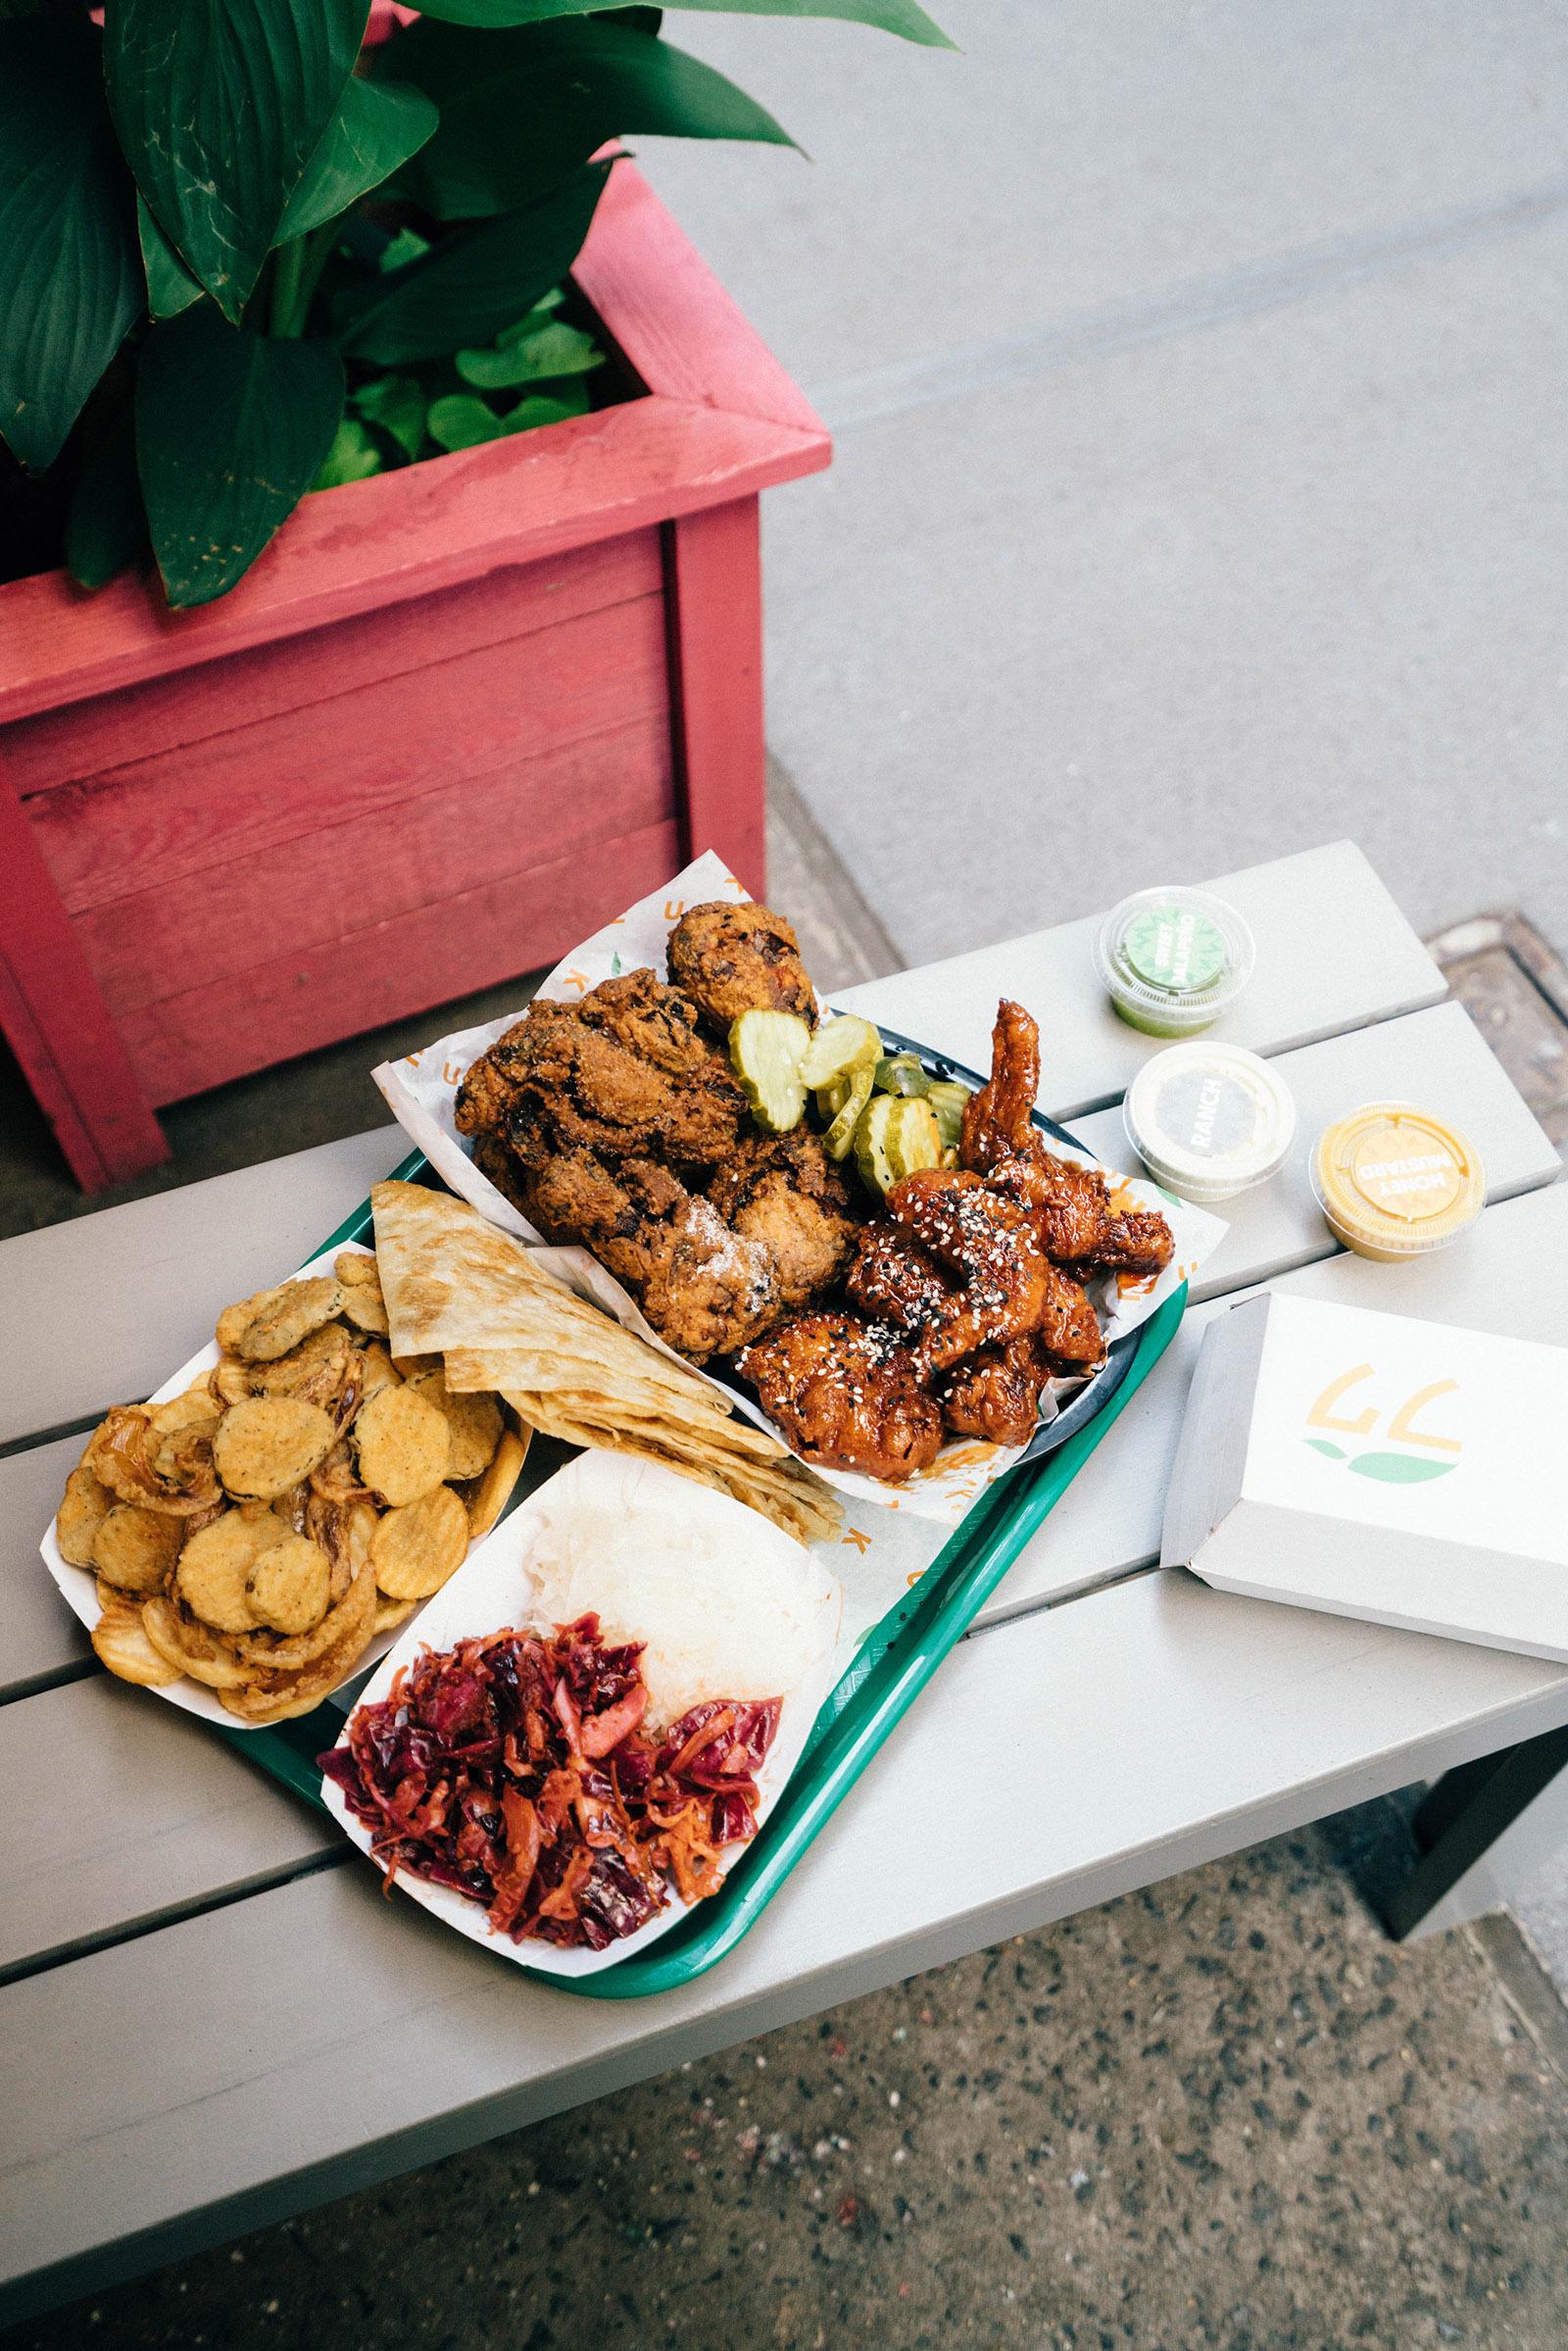 Chimek fried chicken at  Fuku Fidi